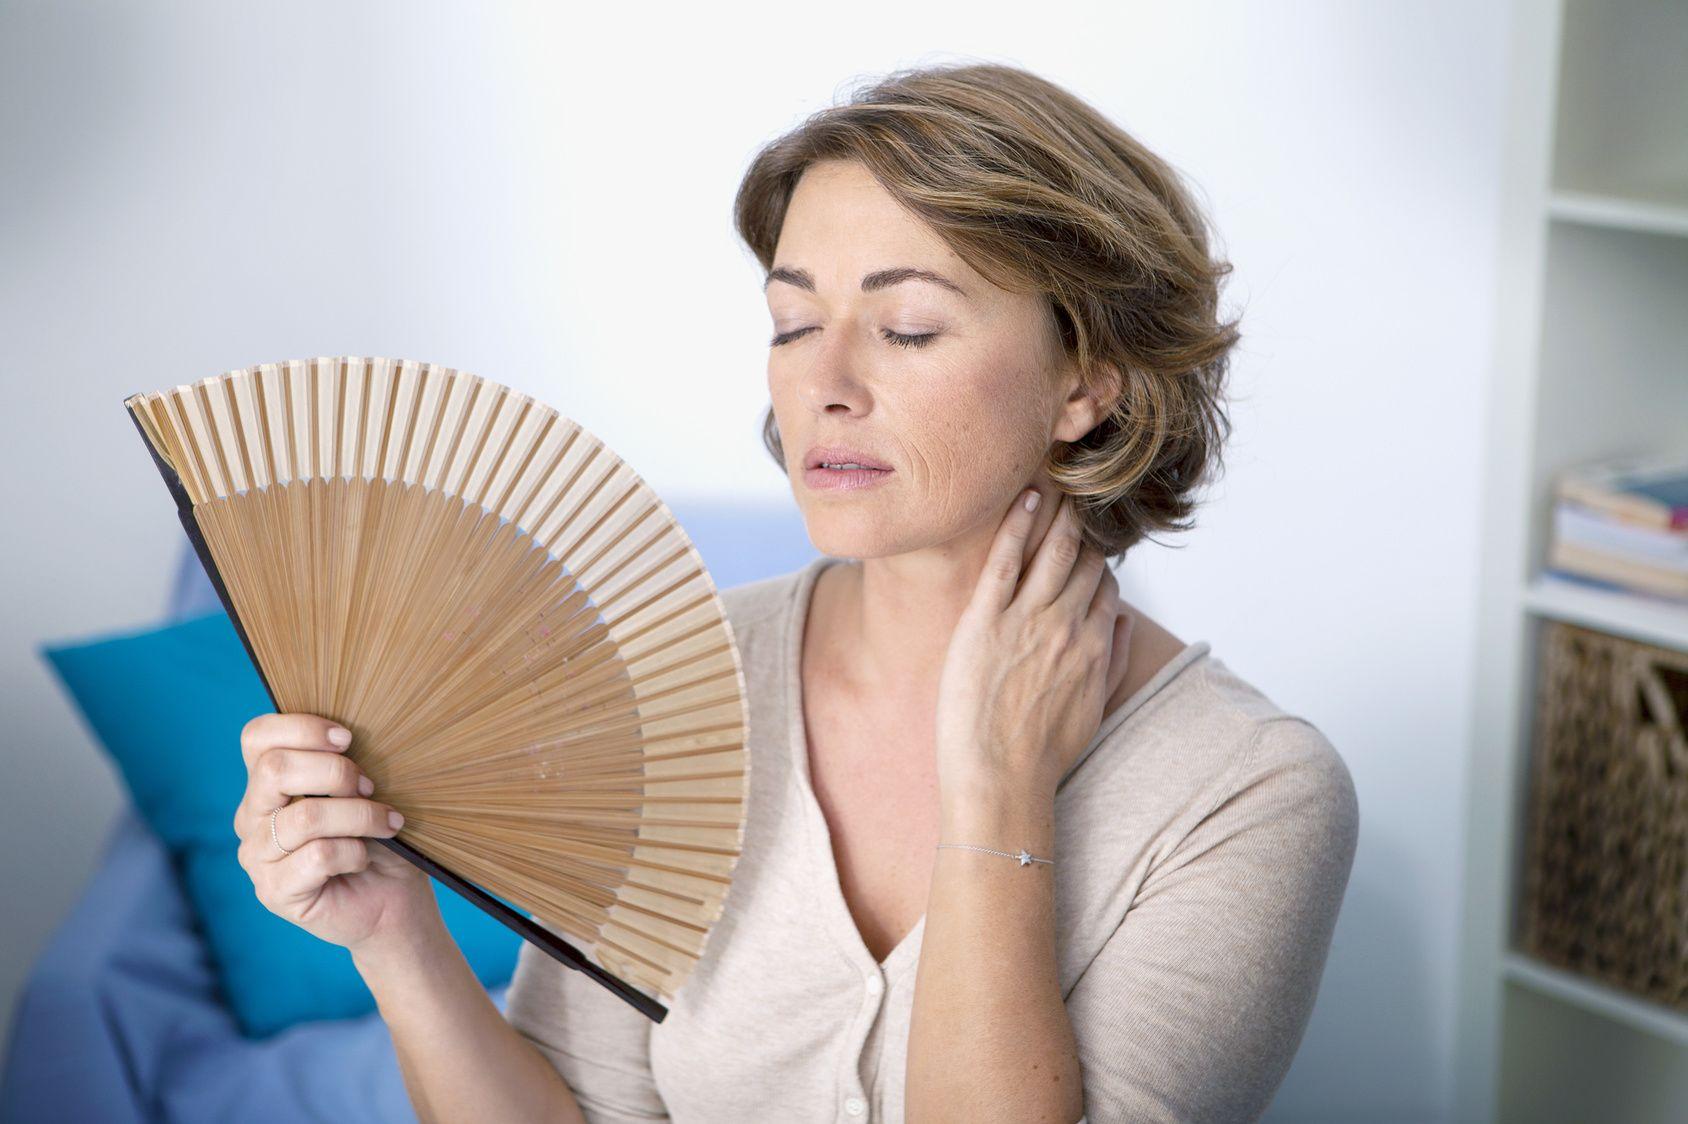 les symptomes de la menopause precoce